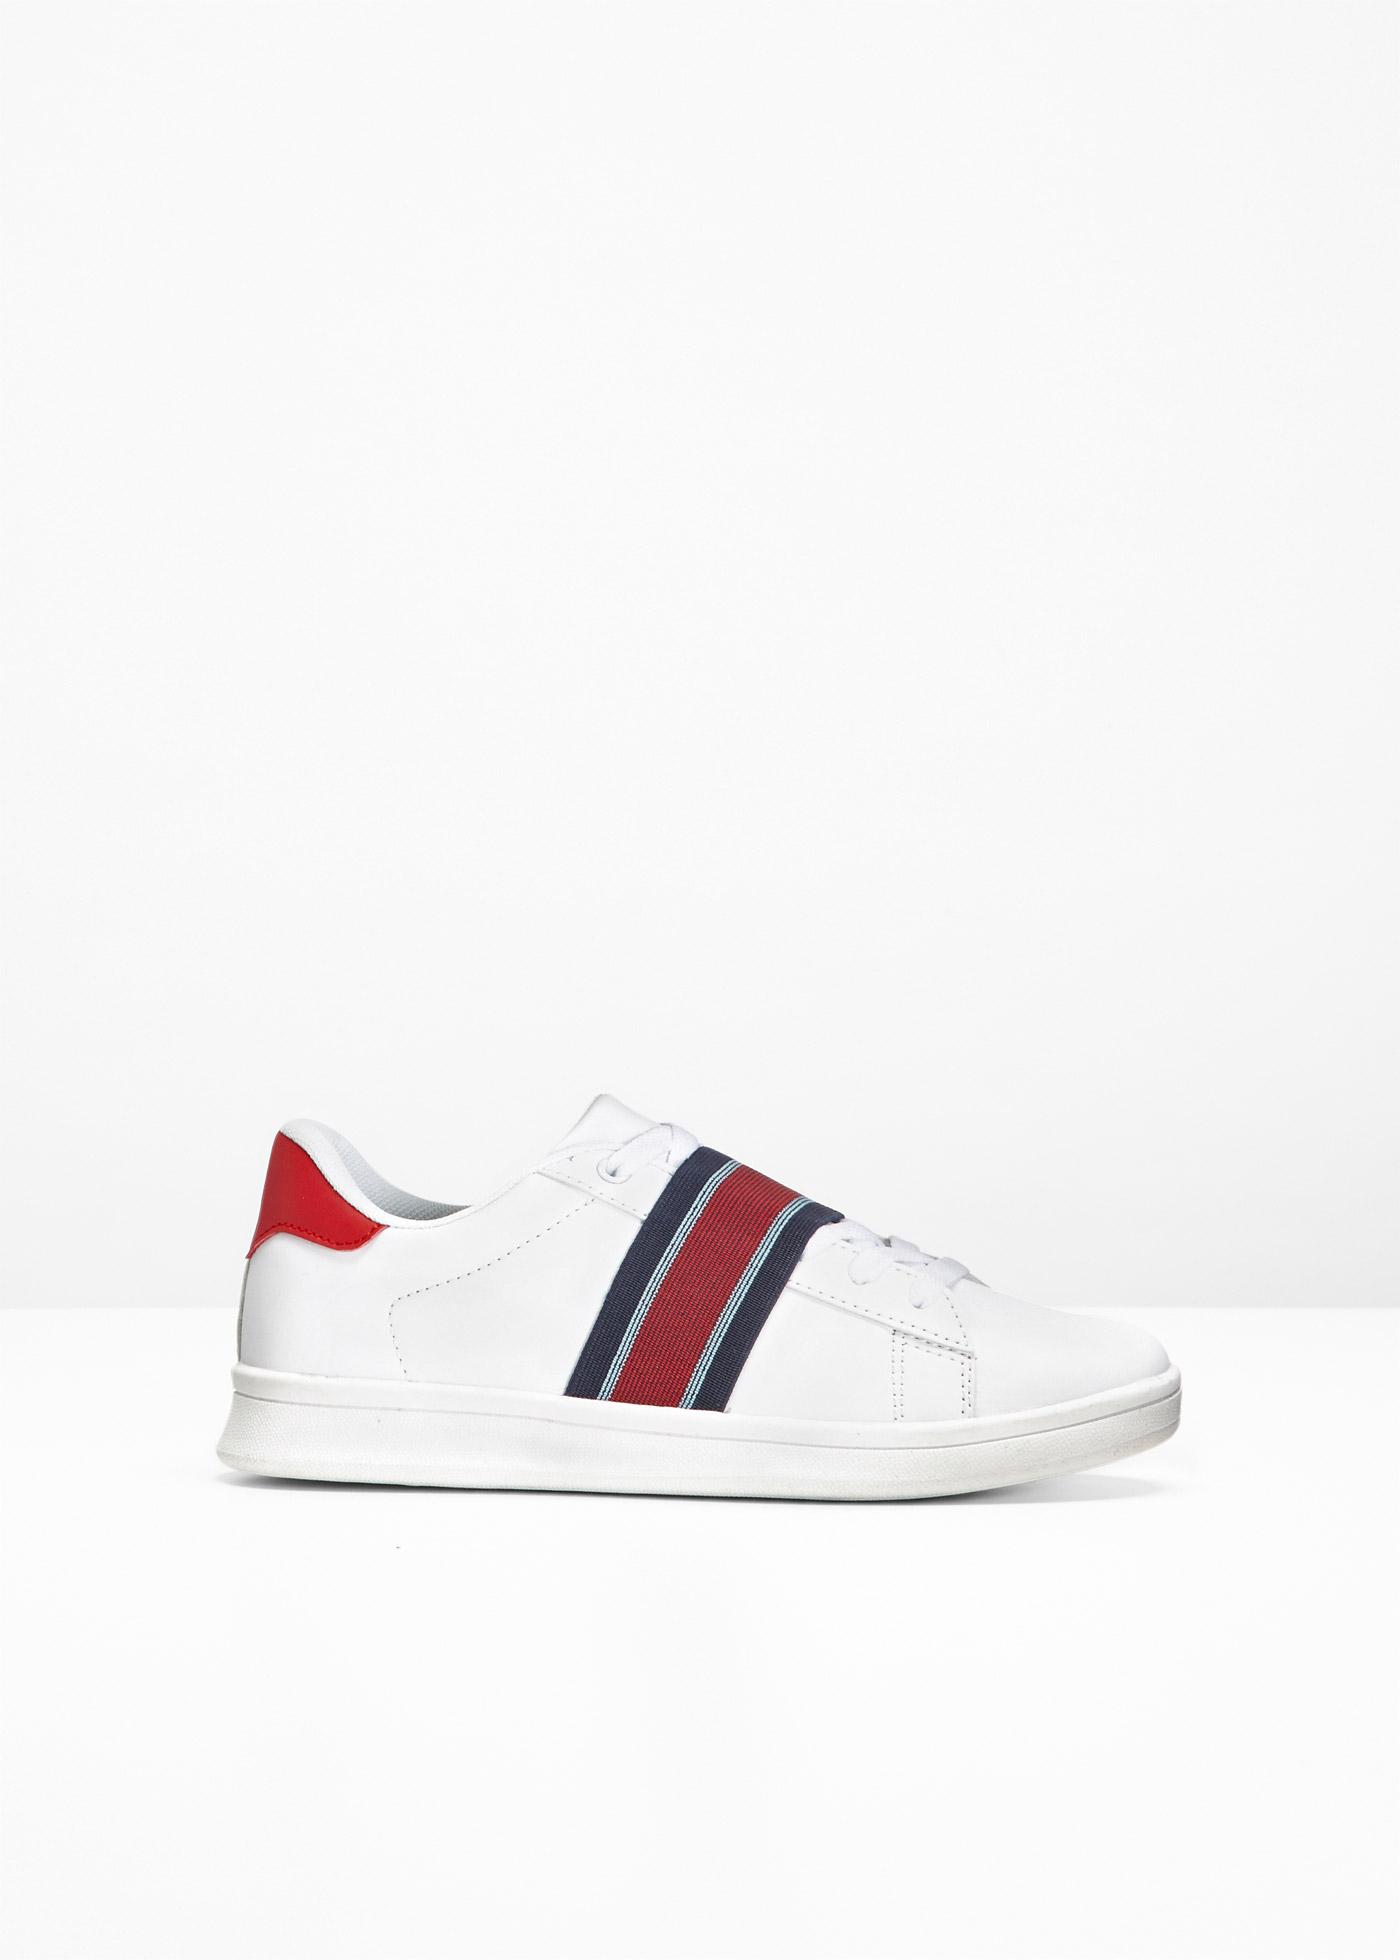 21d6278d05a9 Scarpe Donna SneakerbluBpc Bonprix Scarpe Collection Donna SneakerbluBpc Bonprix  Collection hrsCQxtdB